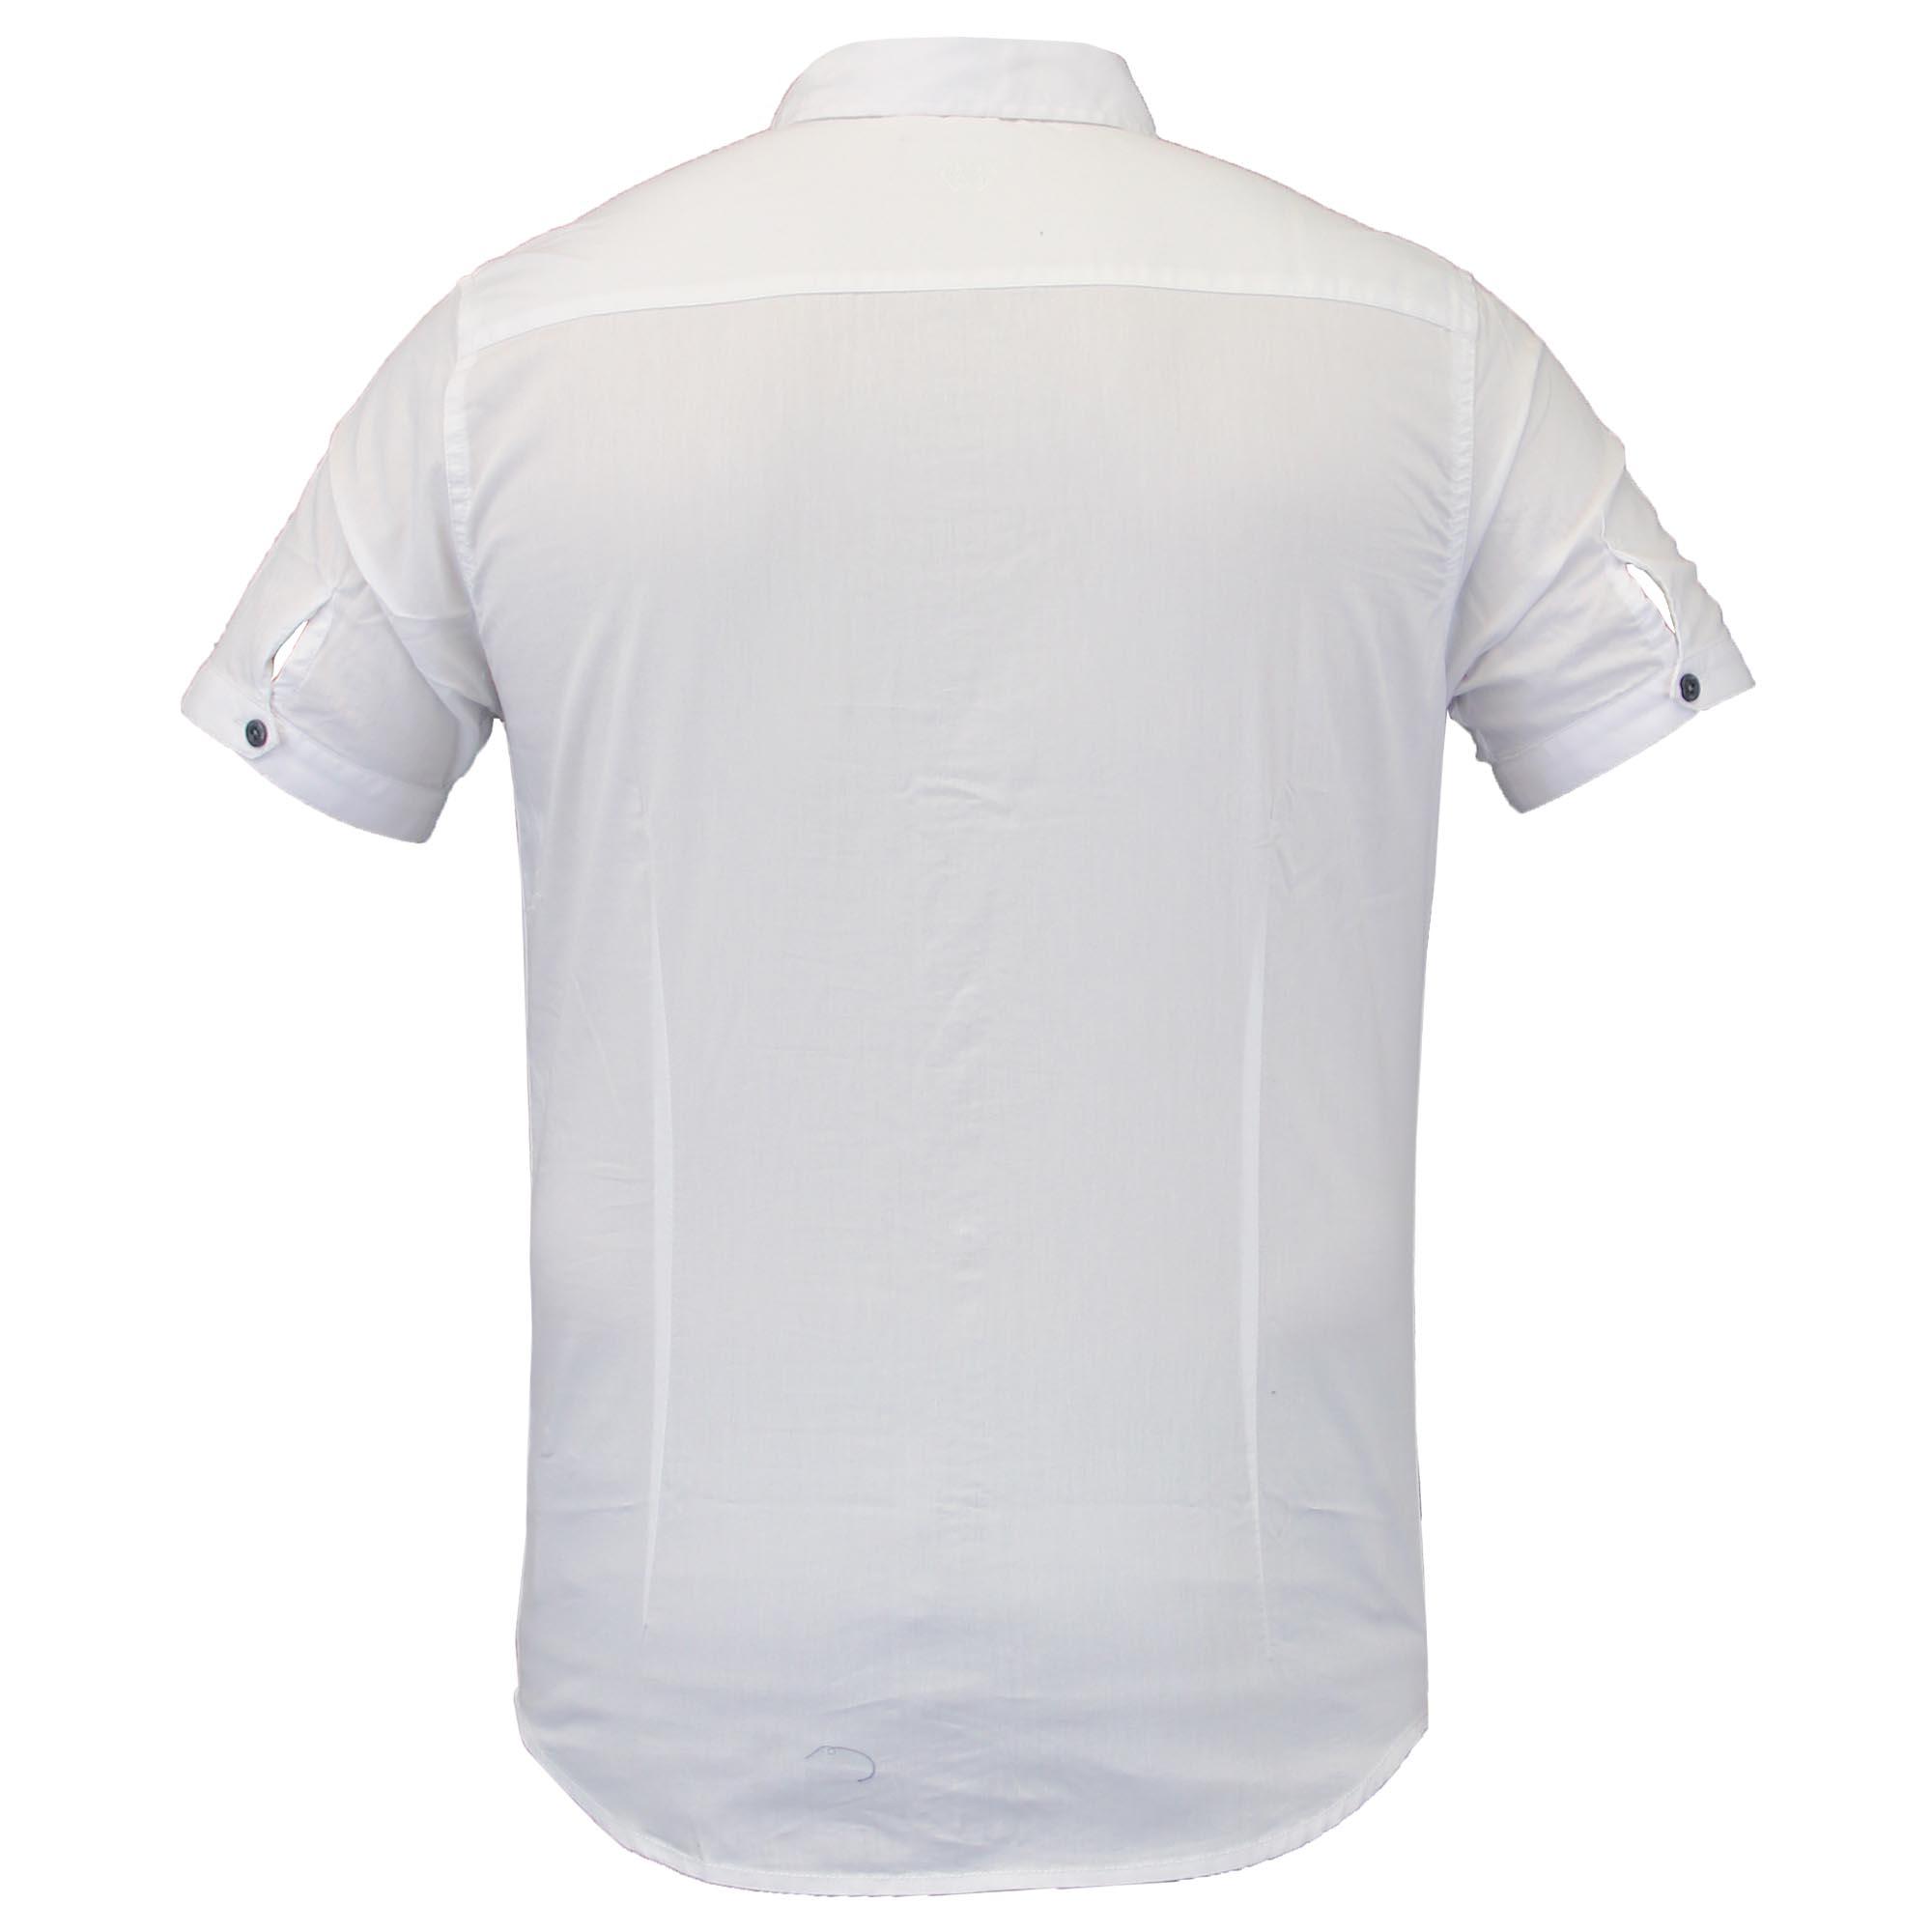 Camisas-de-vestir-para-hombre-de-alma-valiente-Smith-amp-Jones-Manga-Corta-Larga-De-Algodon-Con miniatura 15